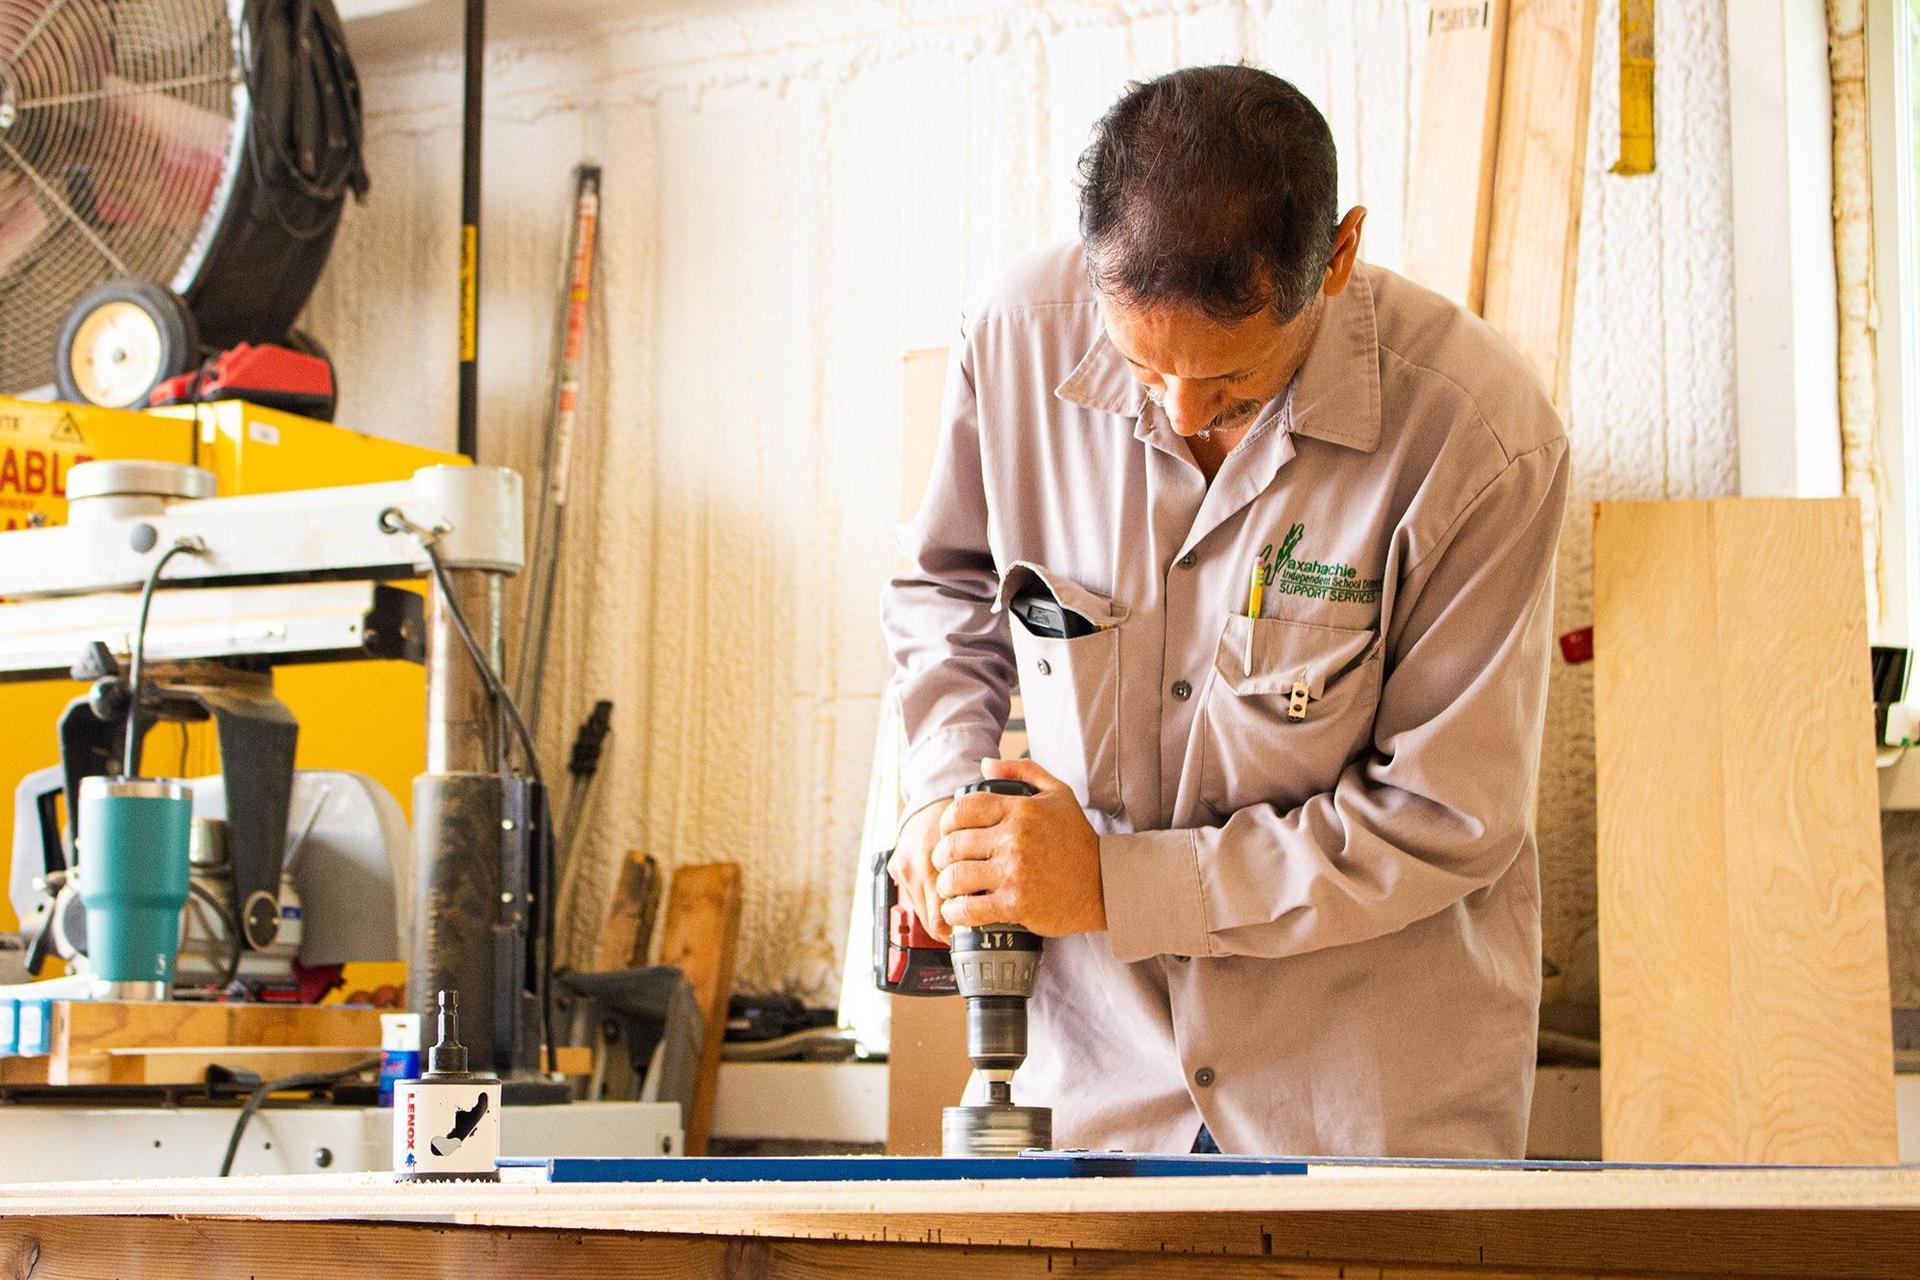 man drilling wood